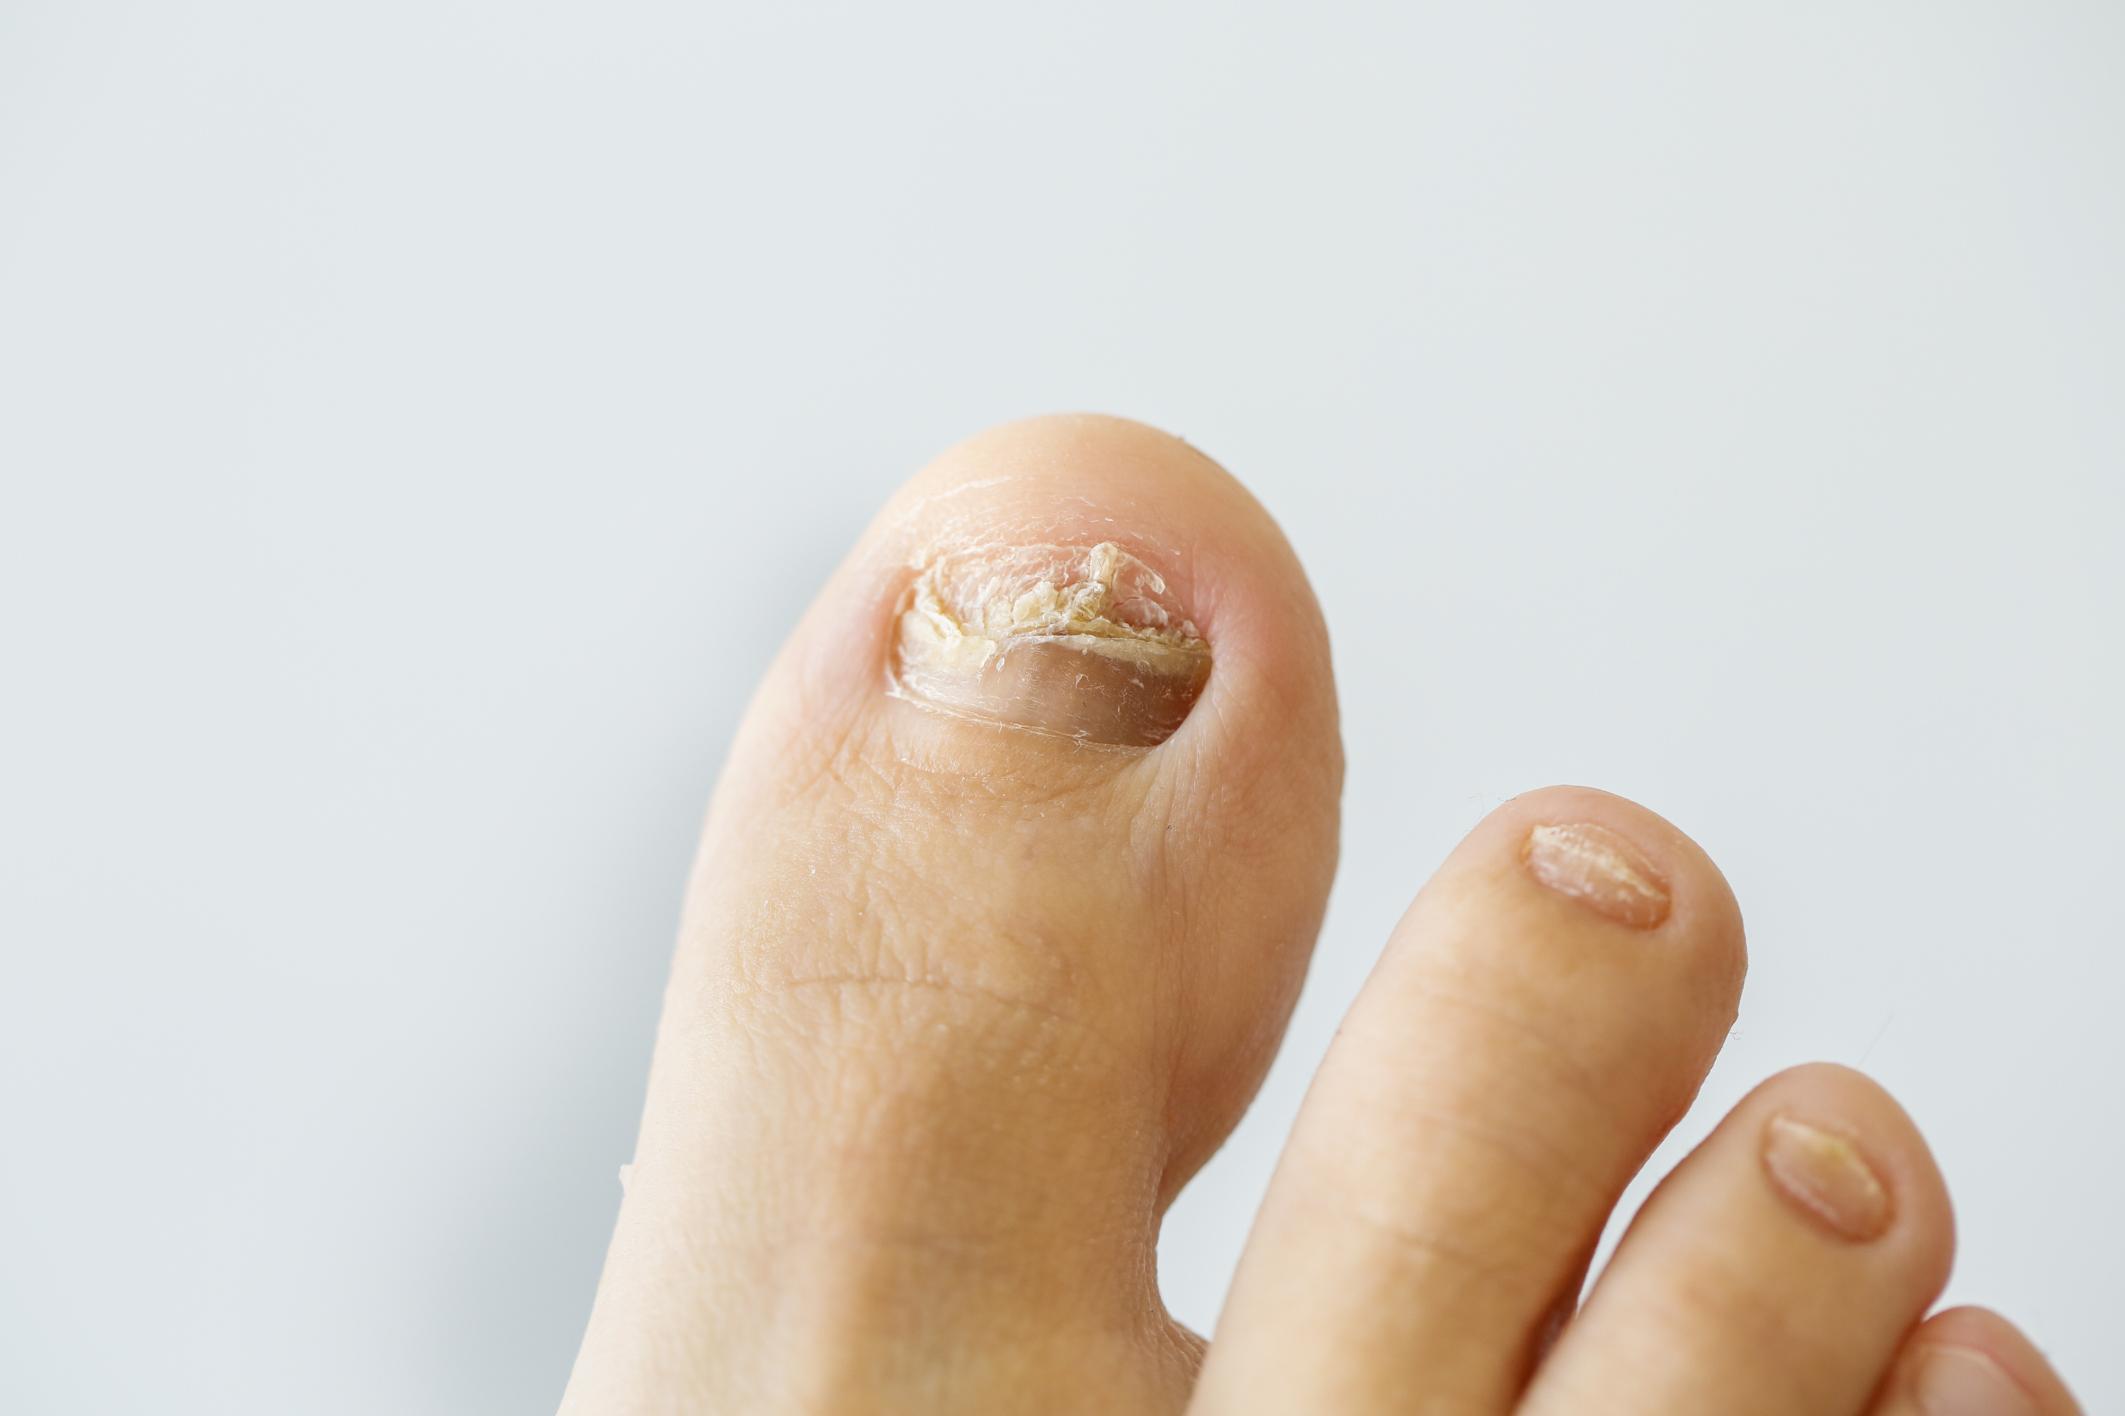 Home Remedy to Kill Nail Fungus | LIVESTRONG.COM